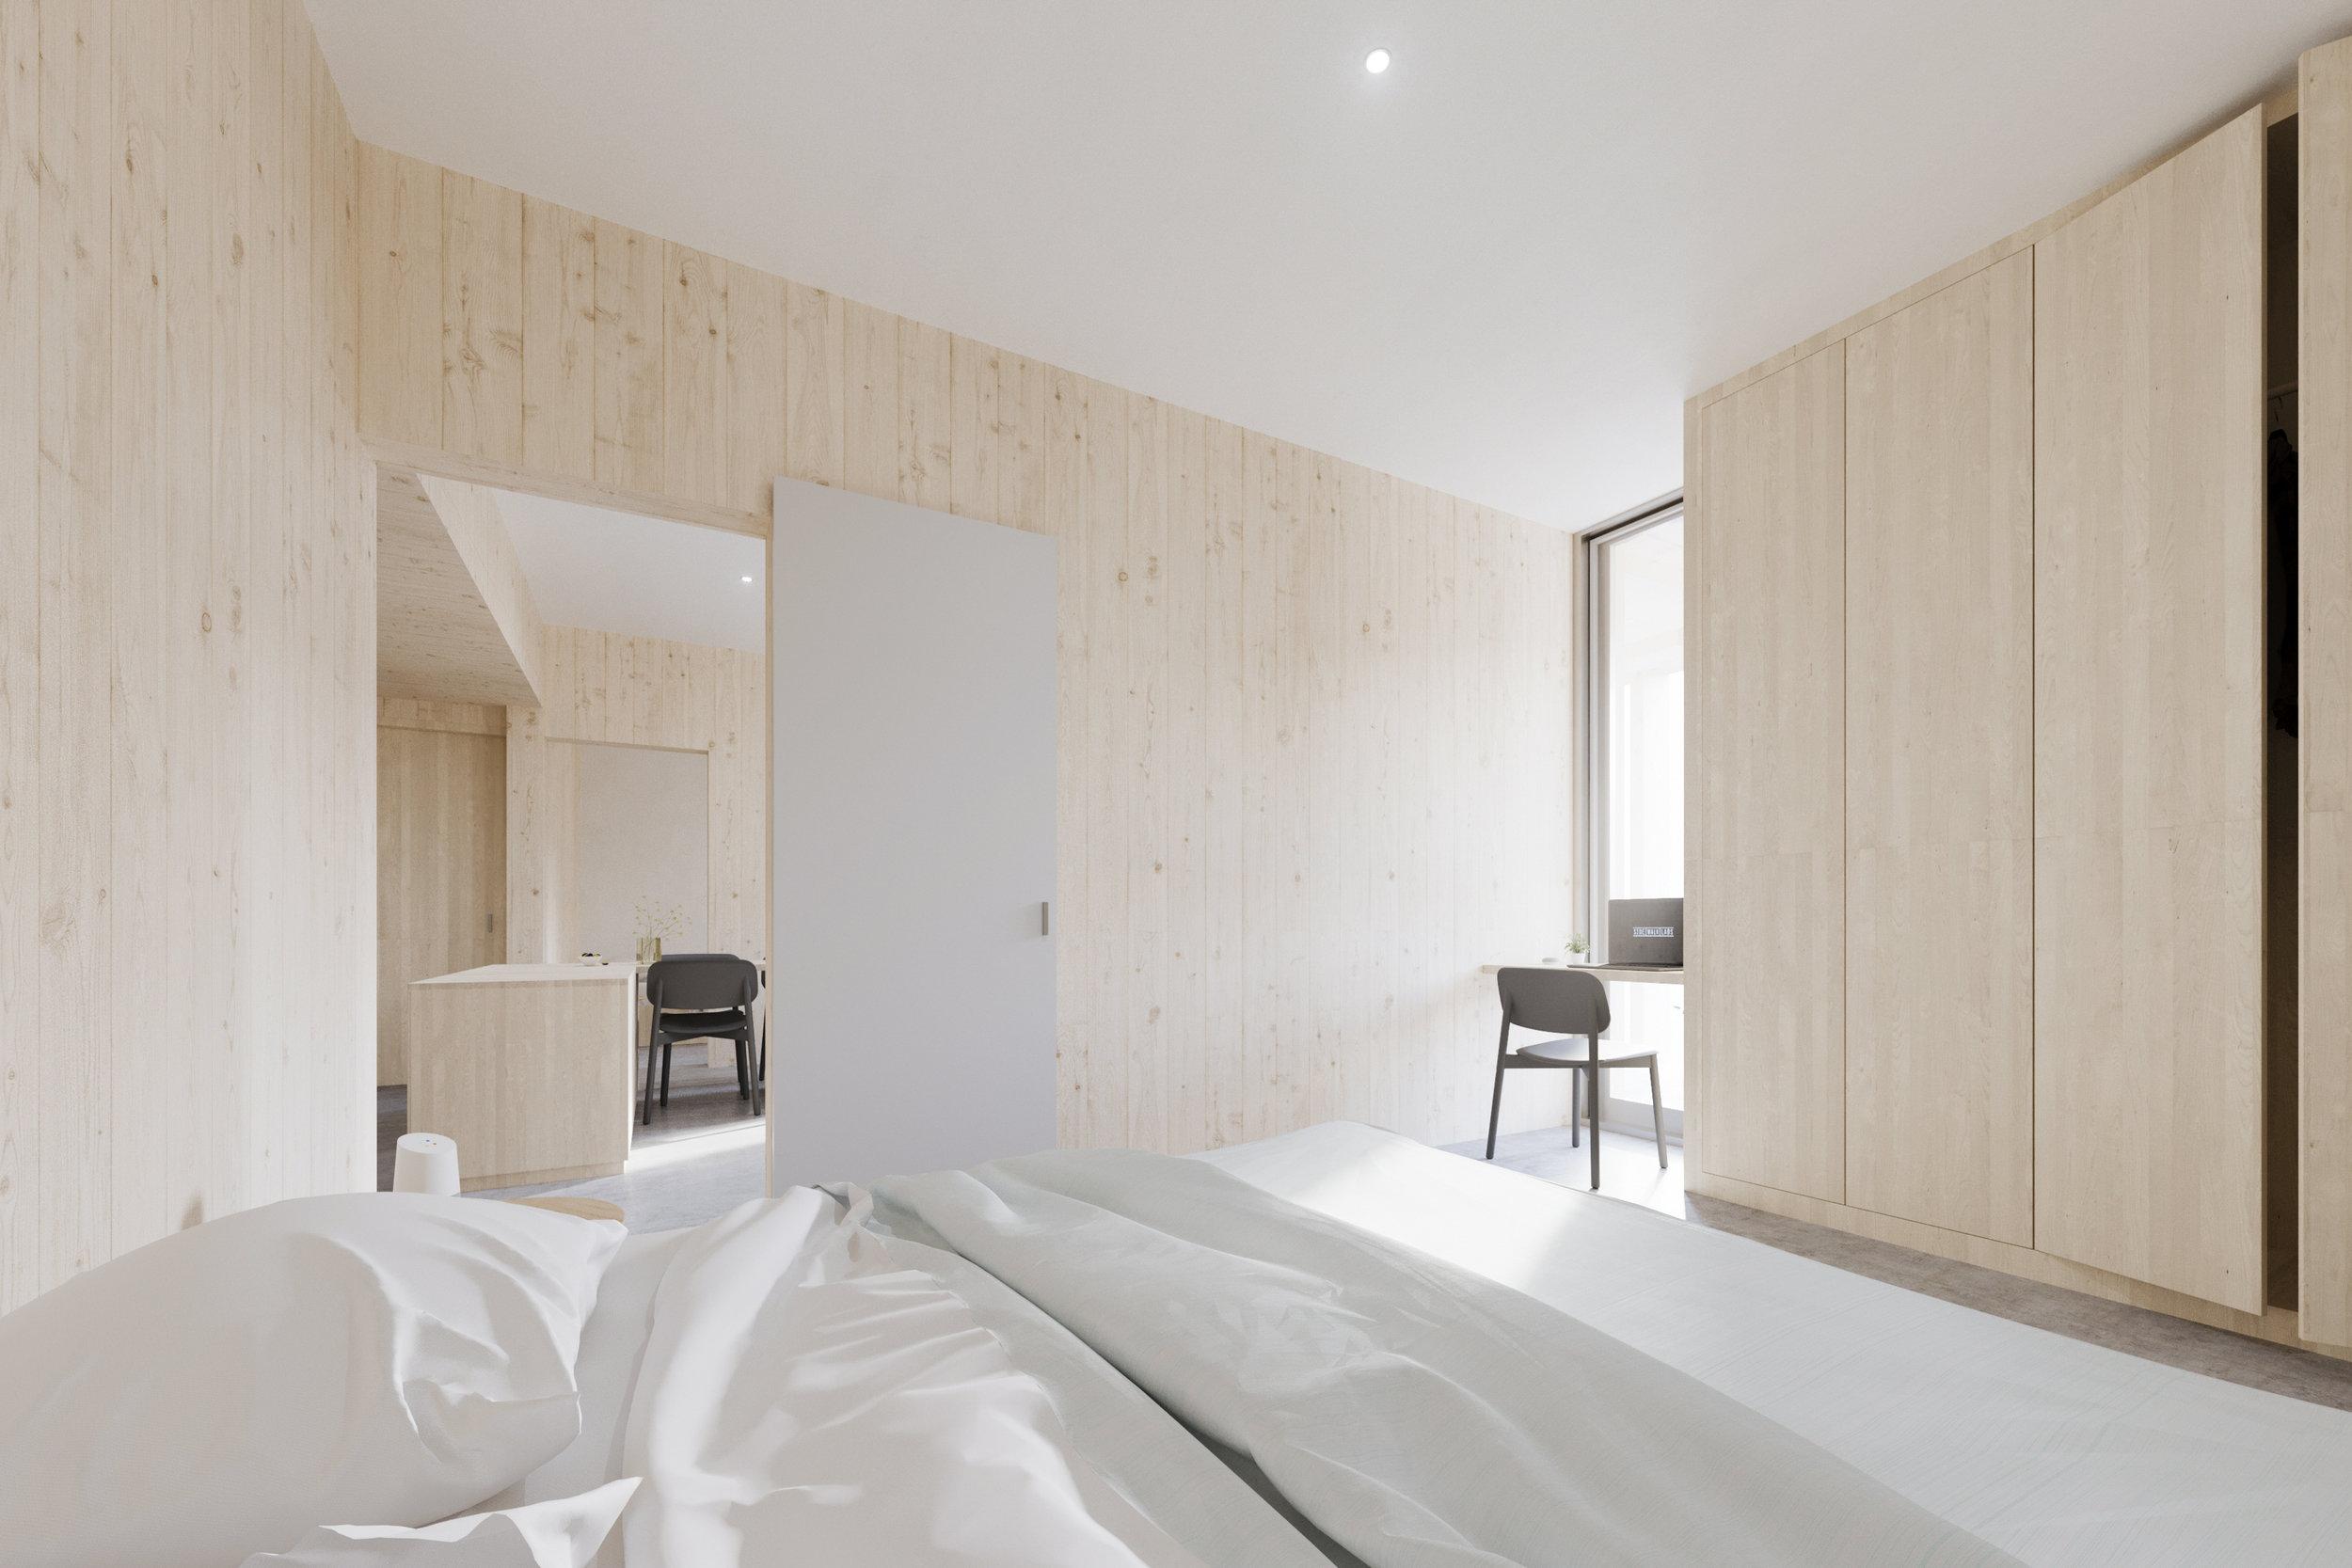 gh3 - SWL - Units - 2BR - Bedroom